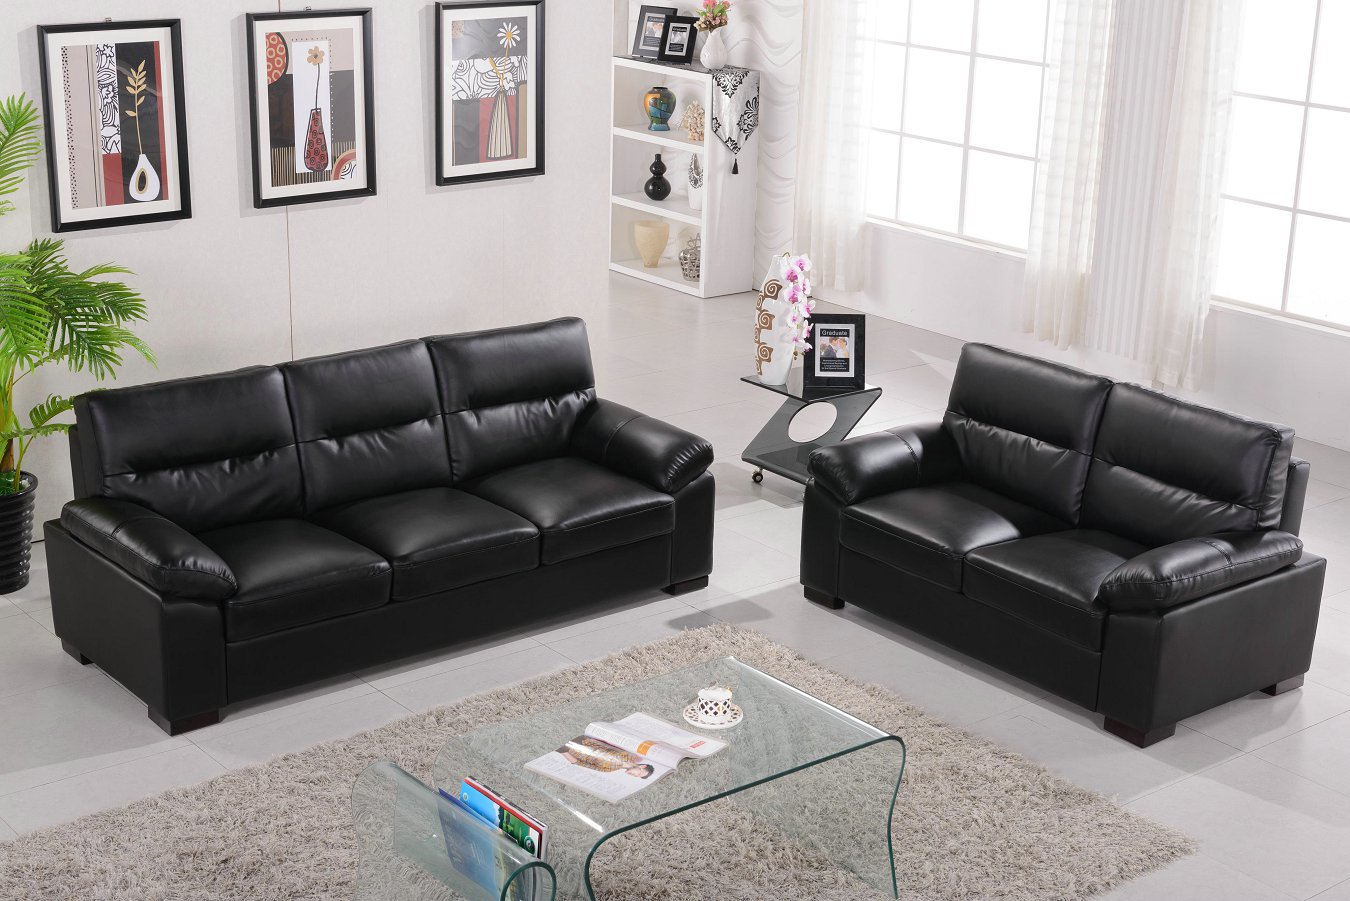 2017 Hot Sale European Style Sofa